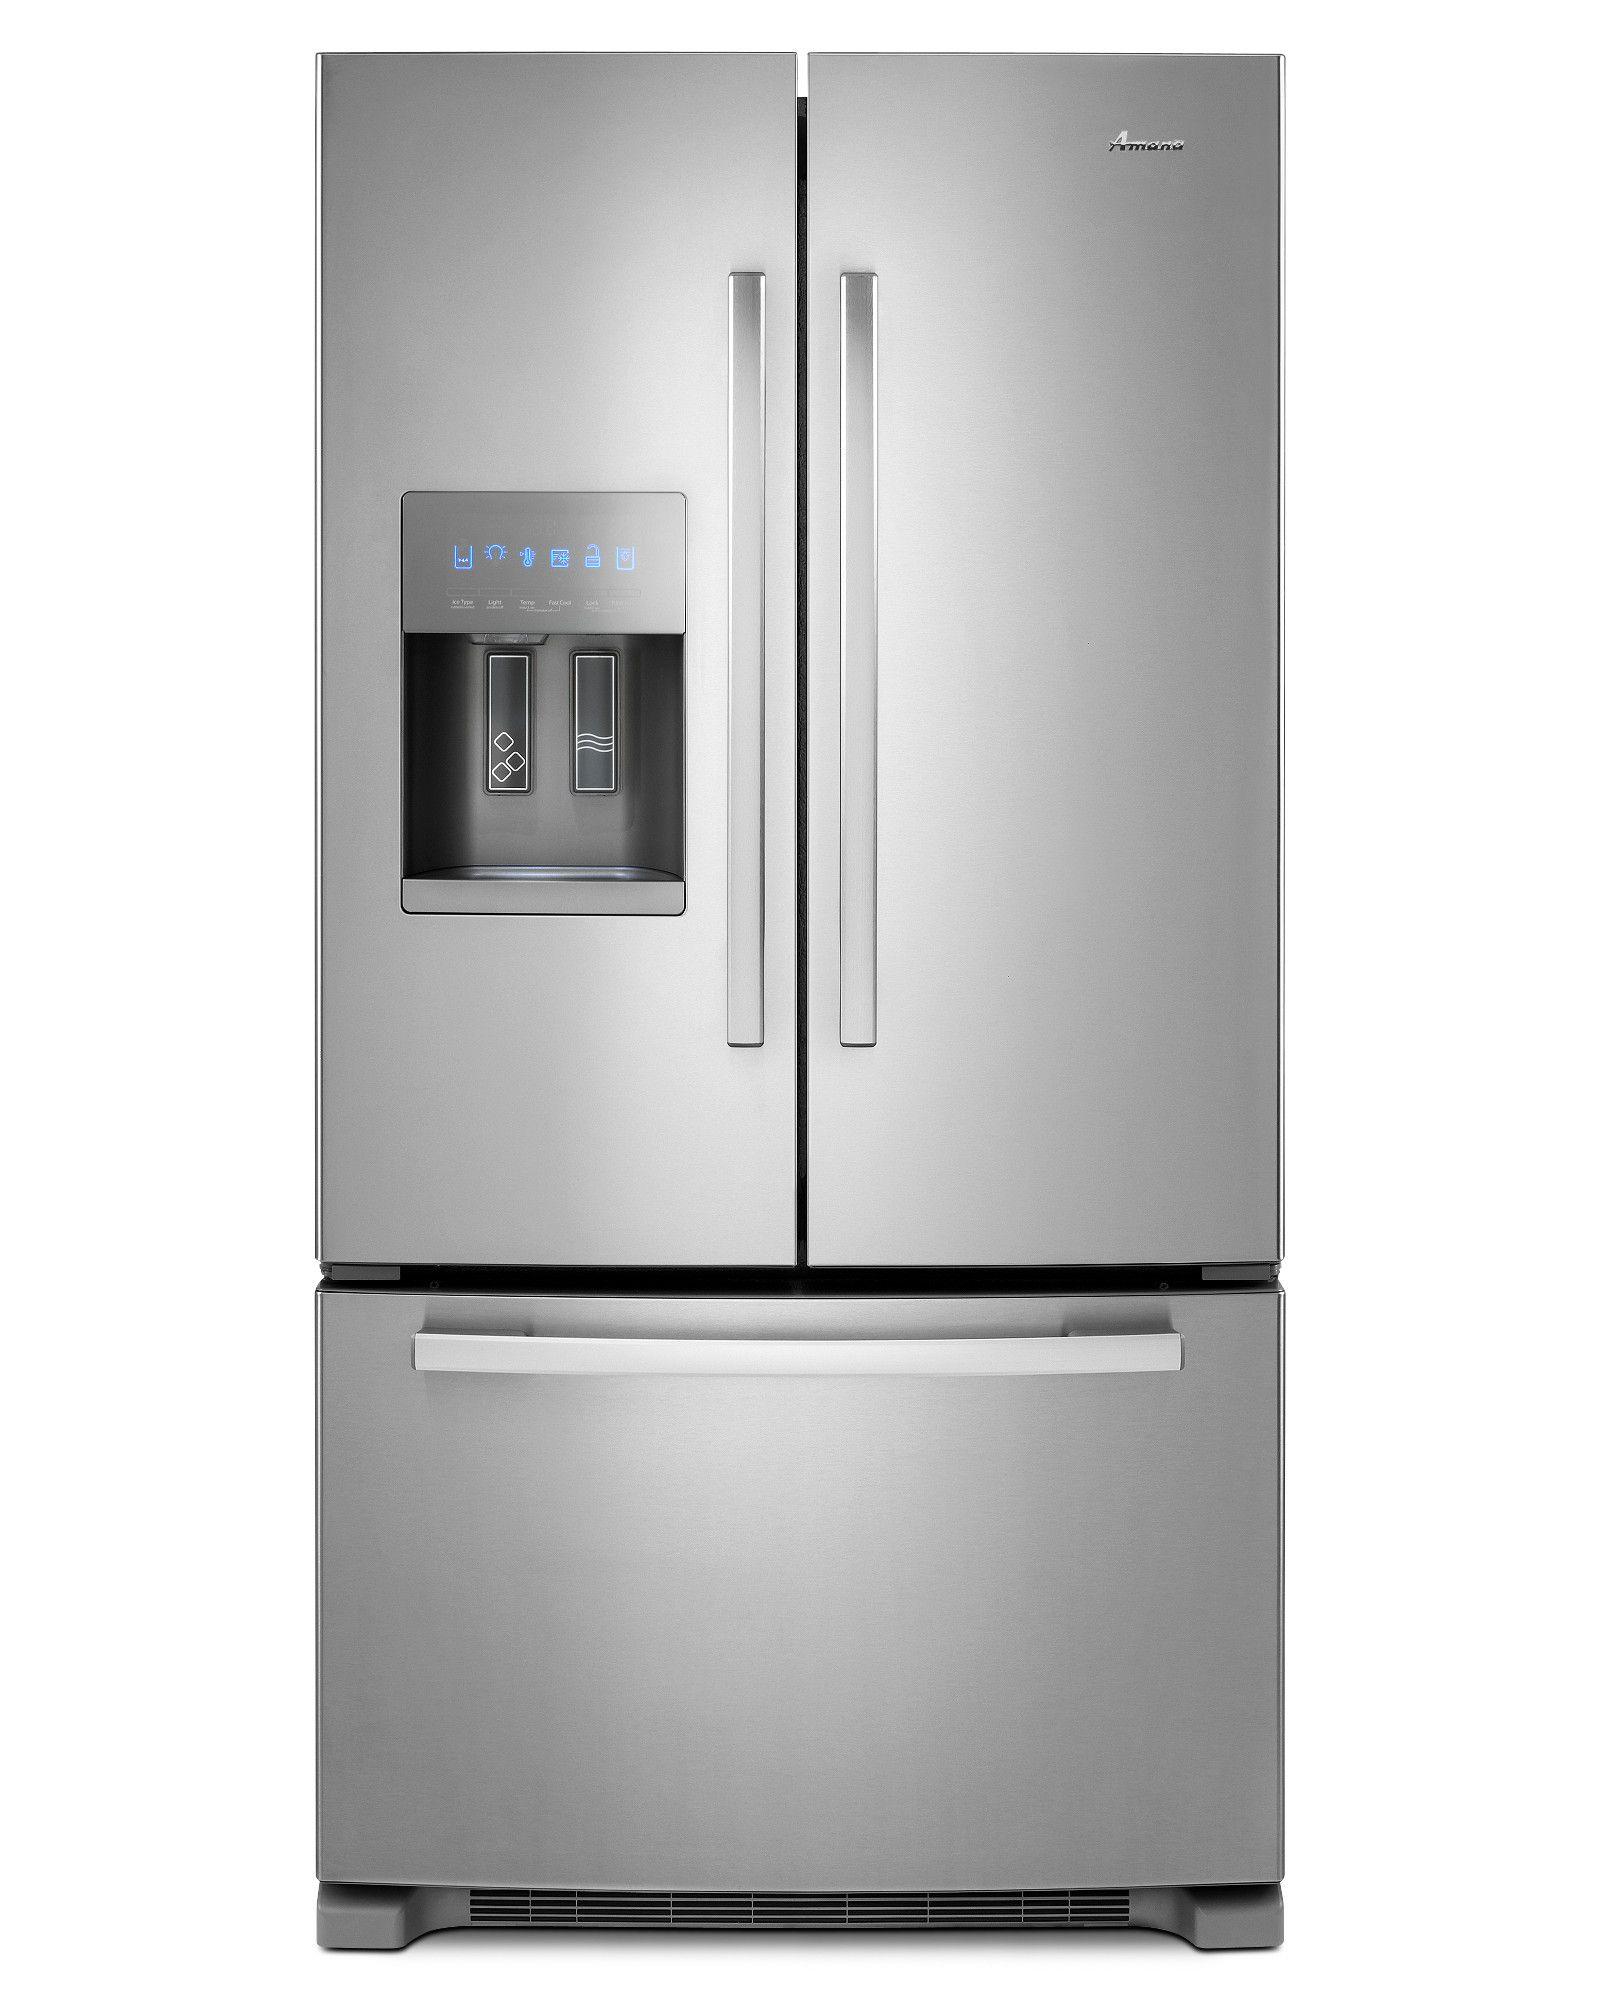 Whirlpool white ice counter depth french door - French Door Bottom Freezer Refrigerator W Fast